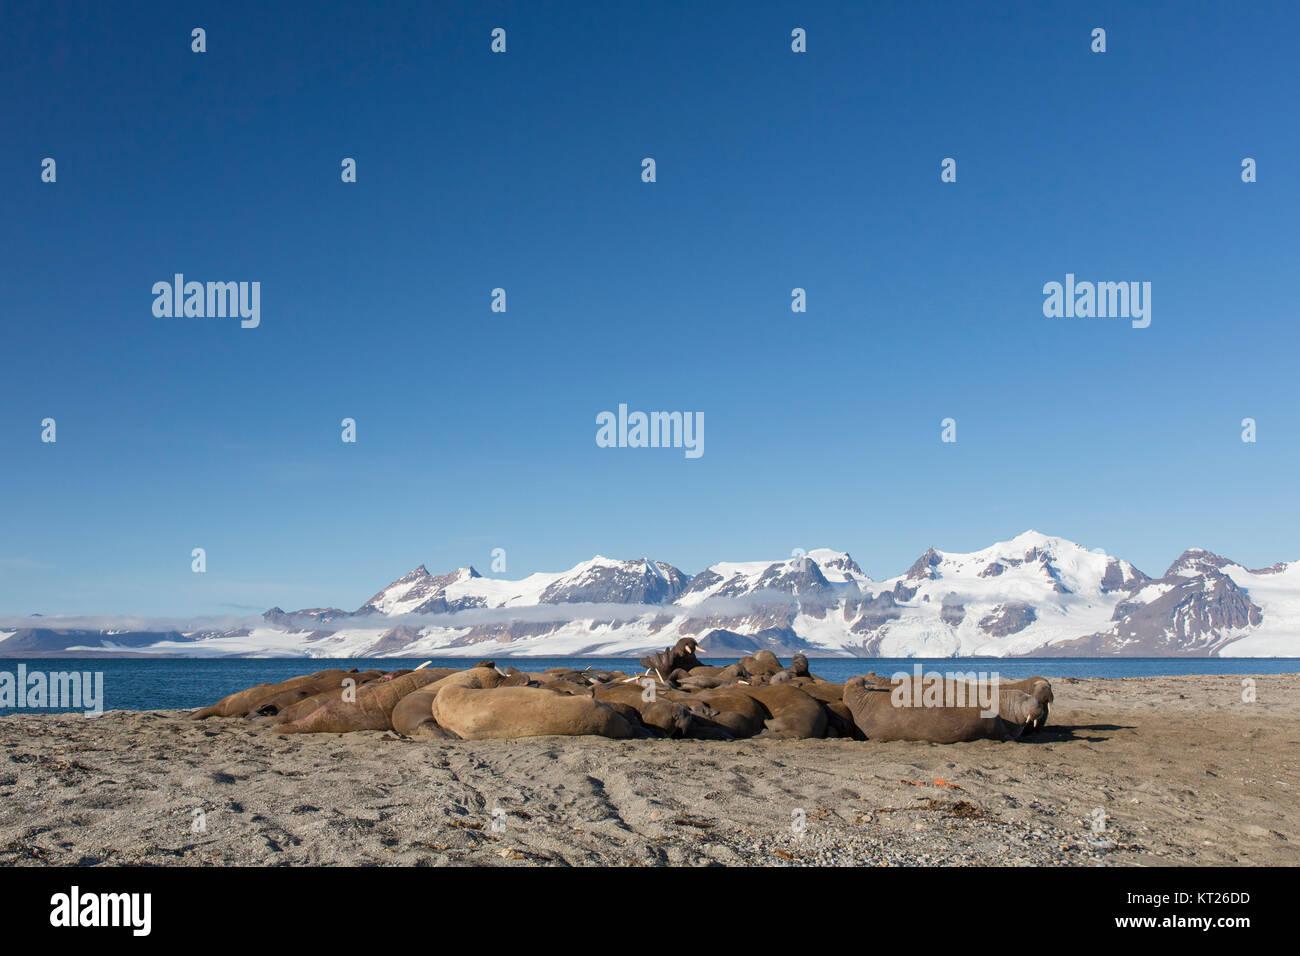 Group of male walruses (Odobenus rosmarus) resting on beach at Phippsøya in Sjuøyane, archipelago north of Nordaustlandet, Stock Photo